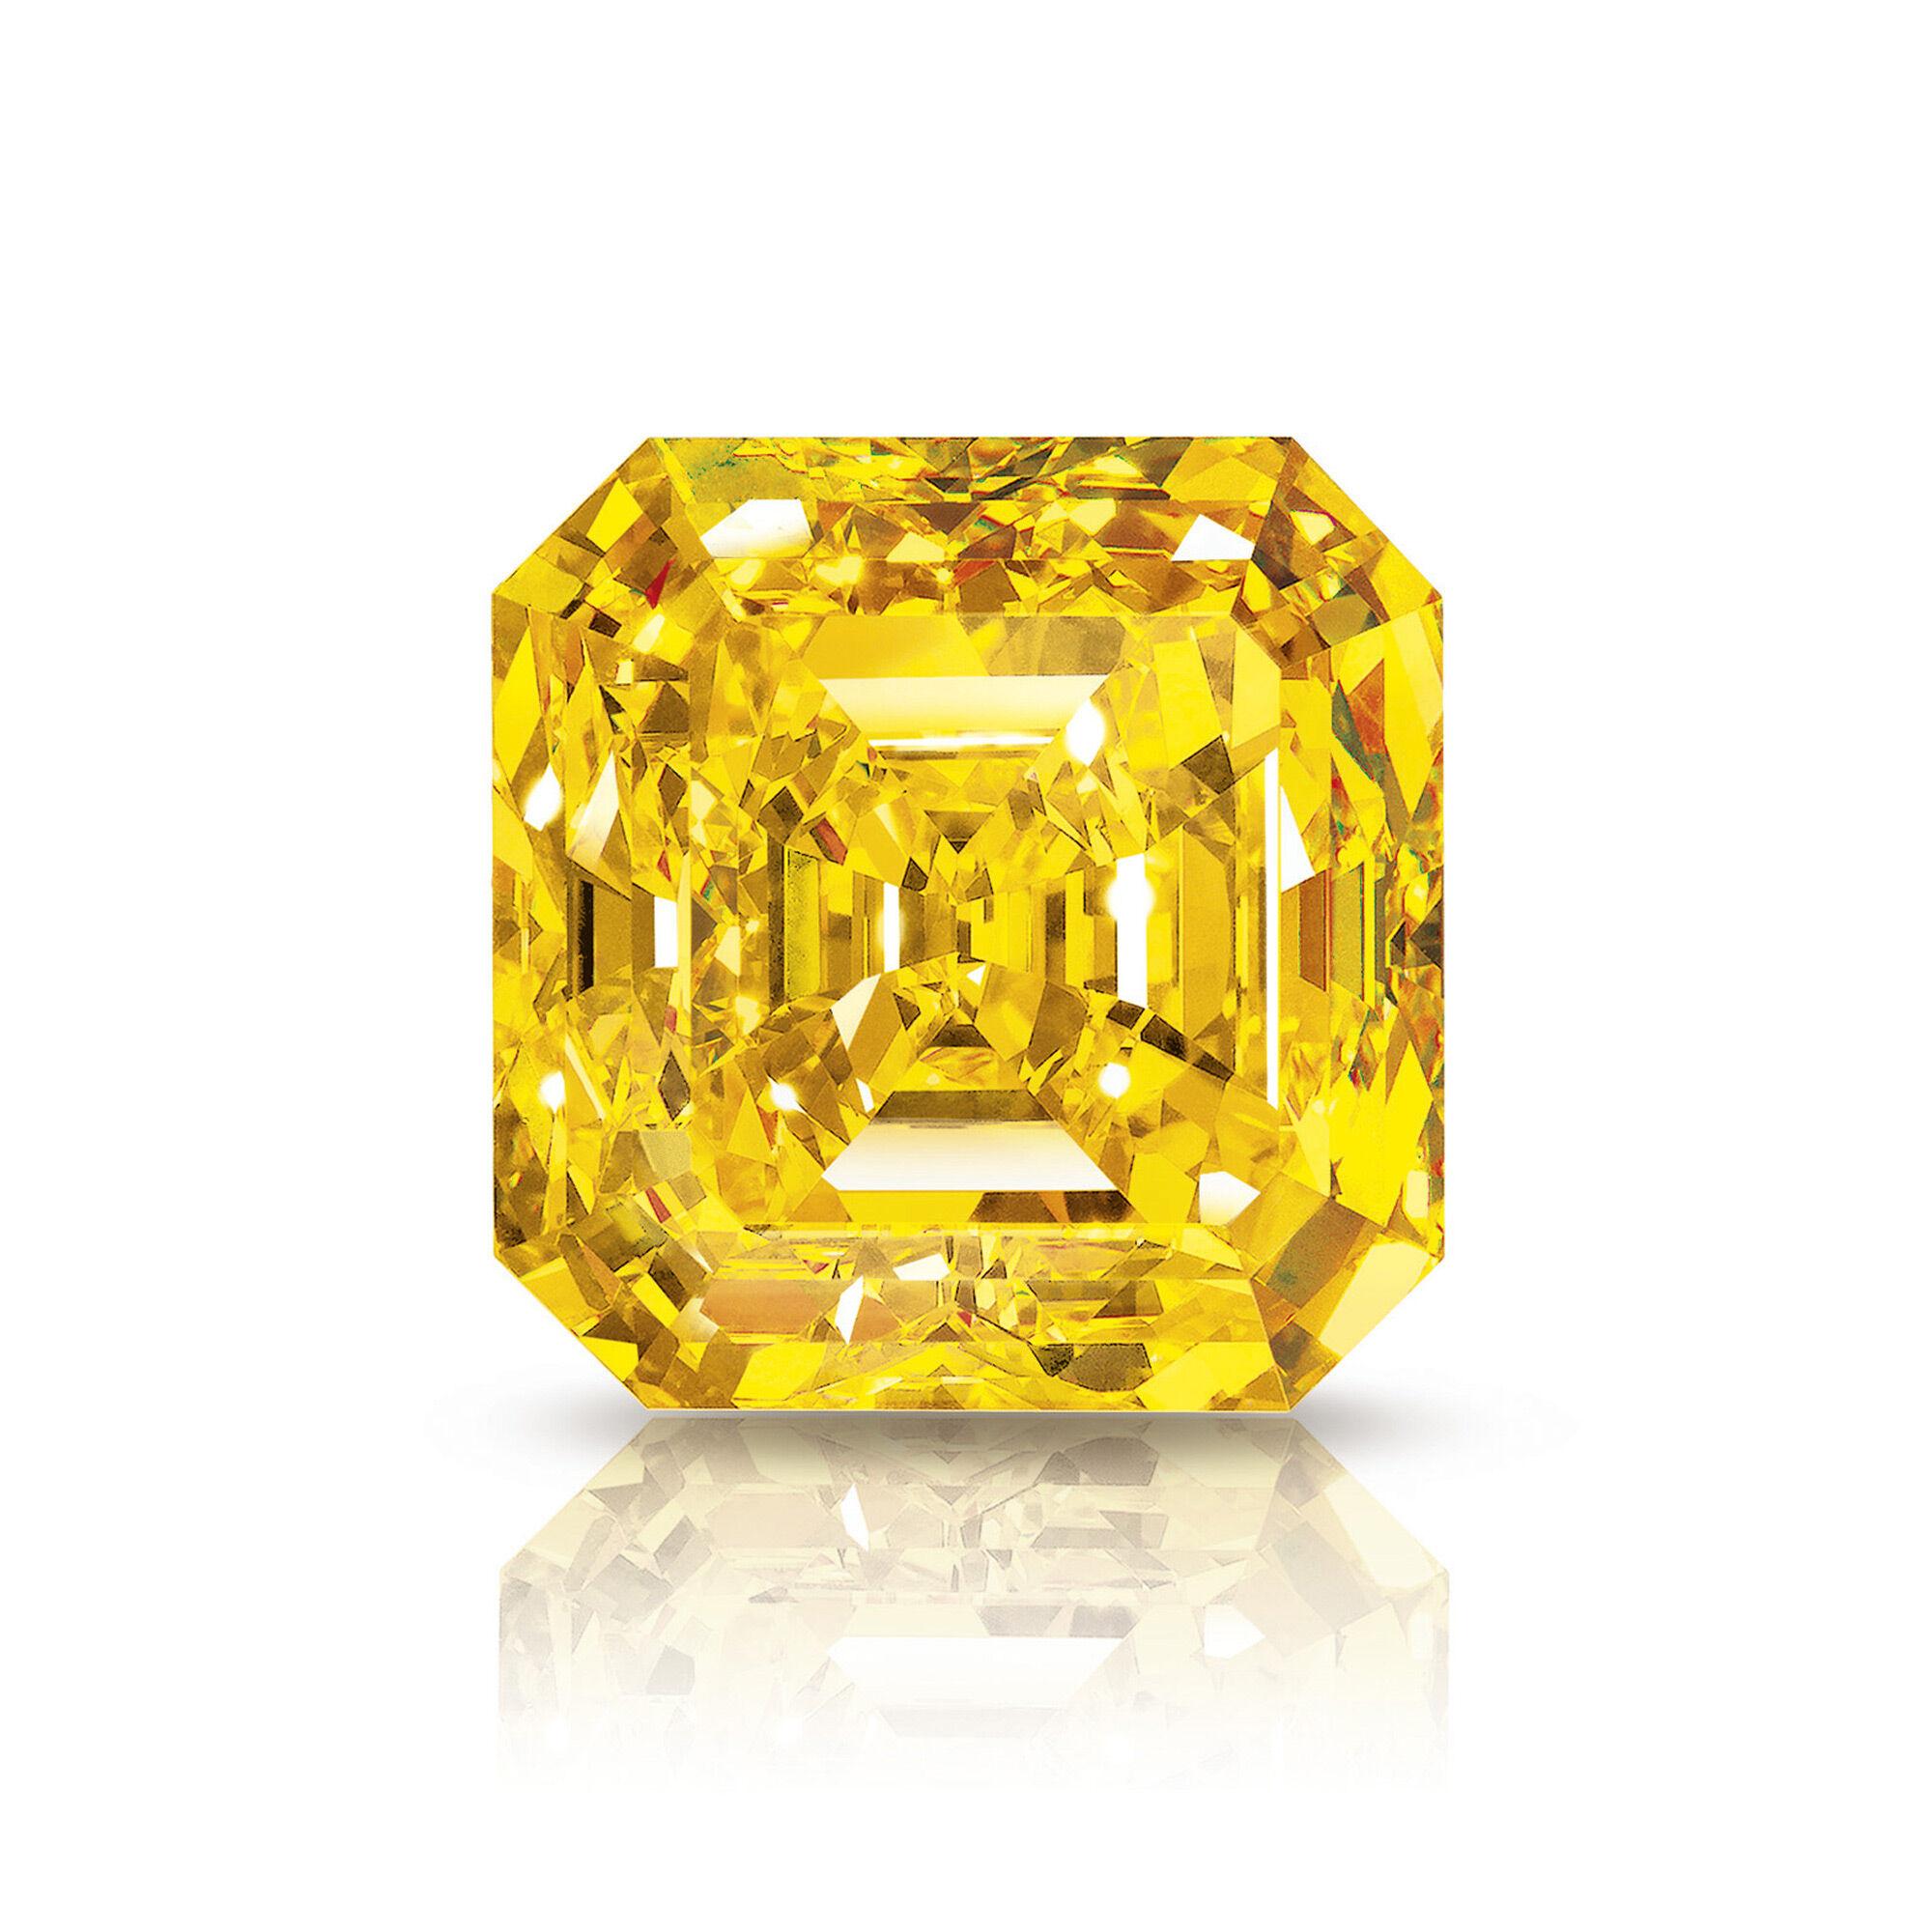 The Delaire Sunrise famous yellow diamond by Graff